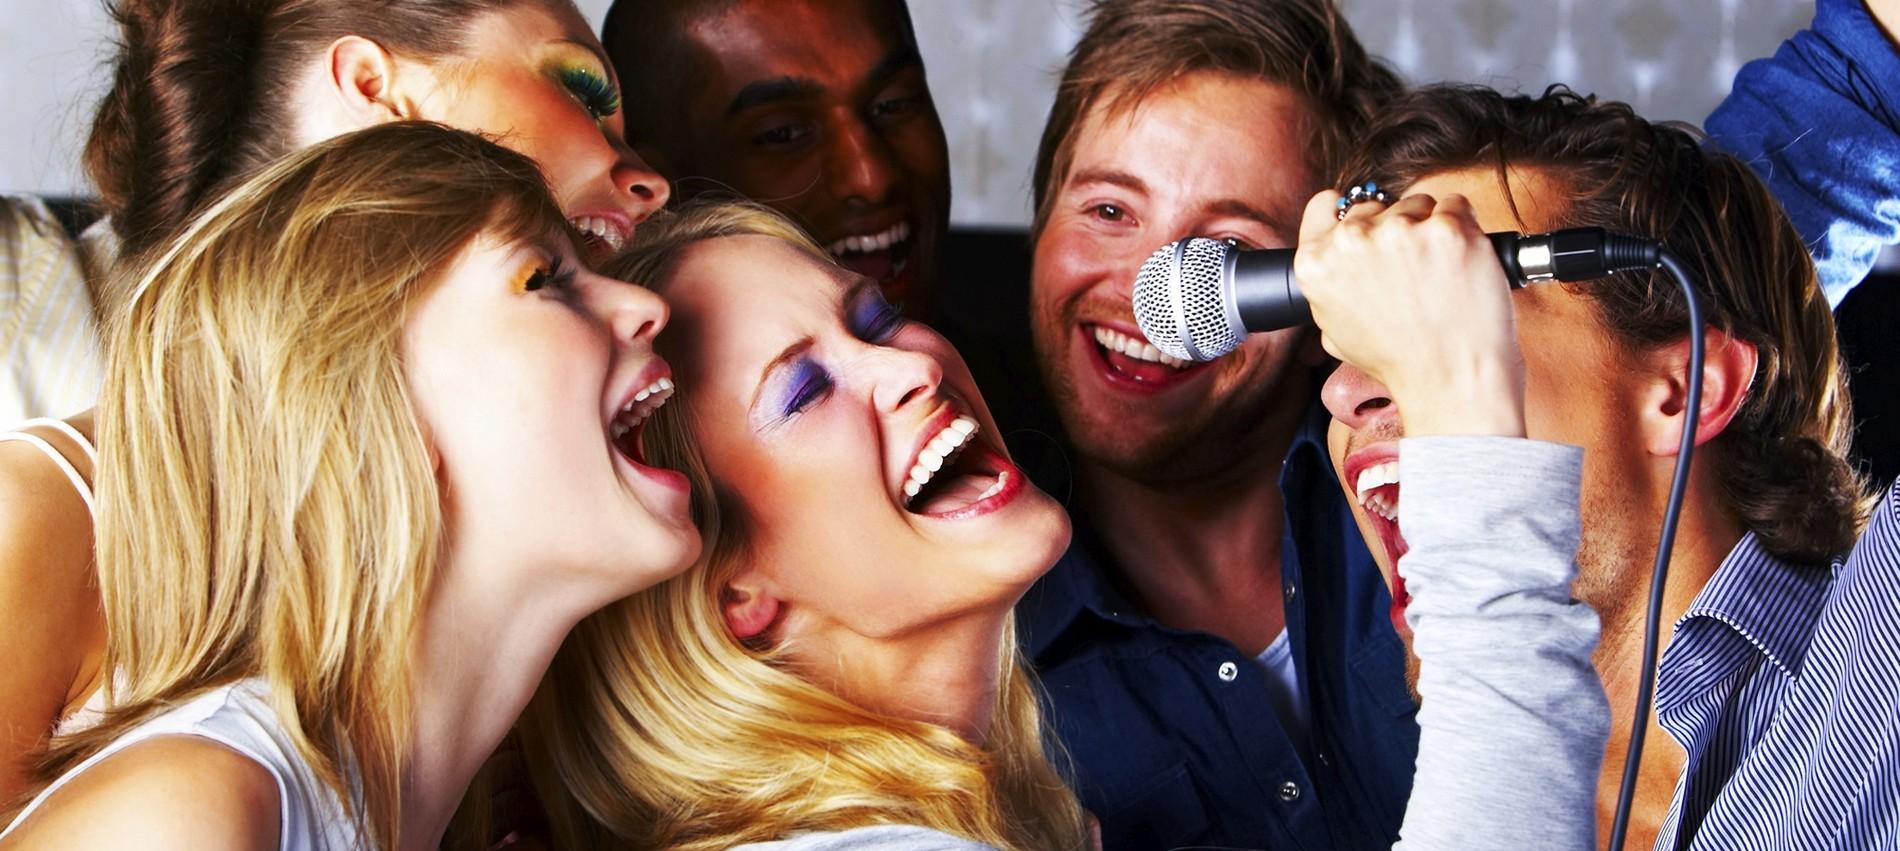 Empresa de Alquiler de Karaoke en Barcelona cenasconkaraoke